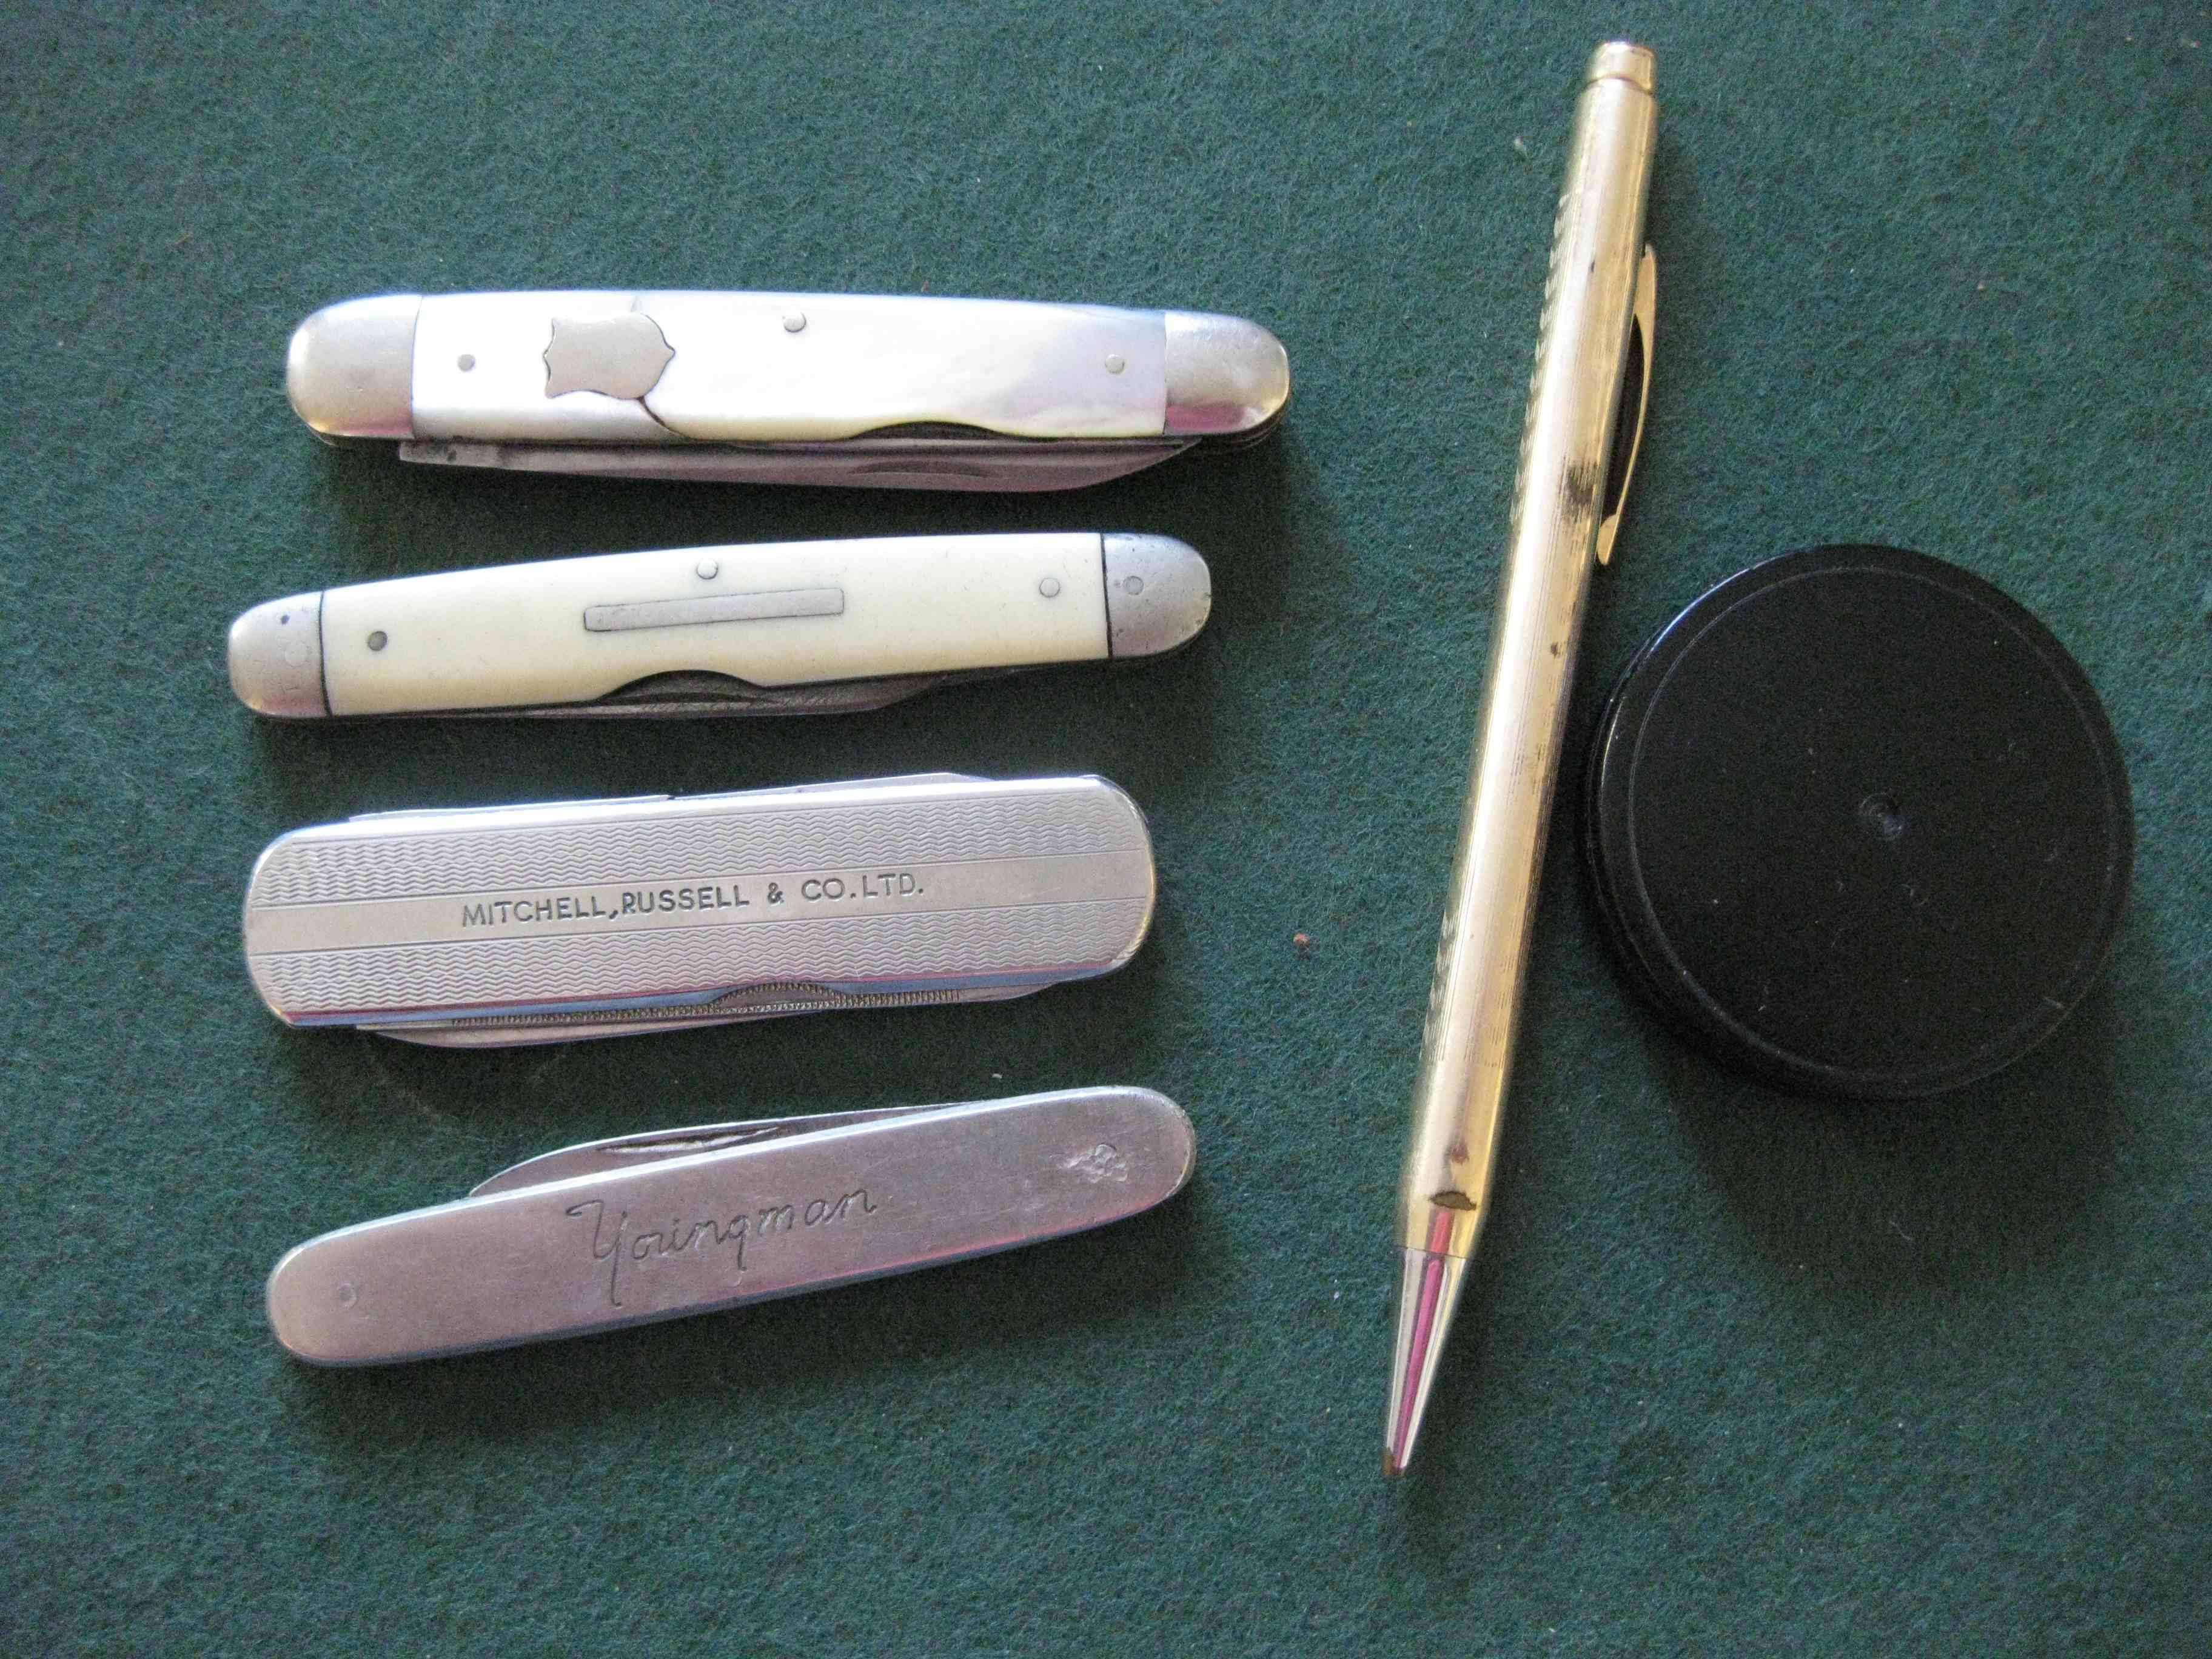 Barbara's penknives low